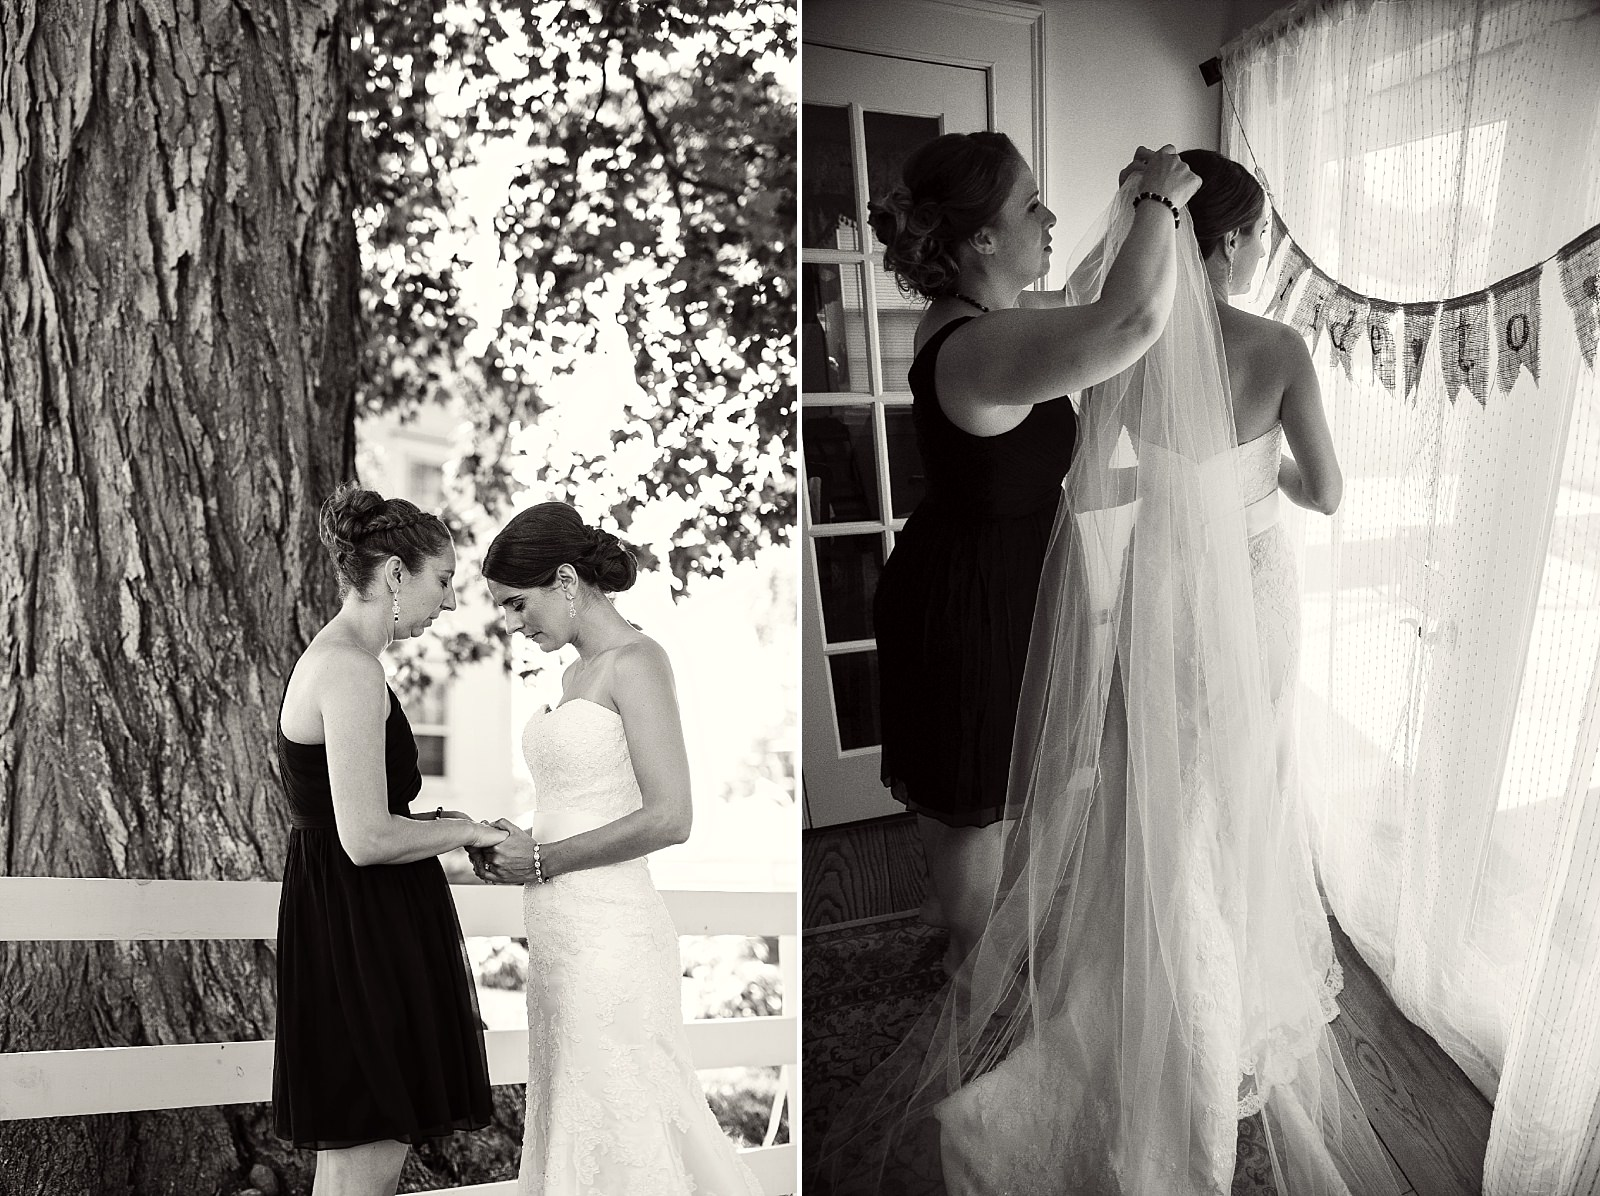 CT_Wedding_Photographer_LiNa_Wed_33.jpg